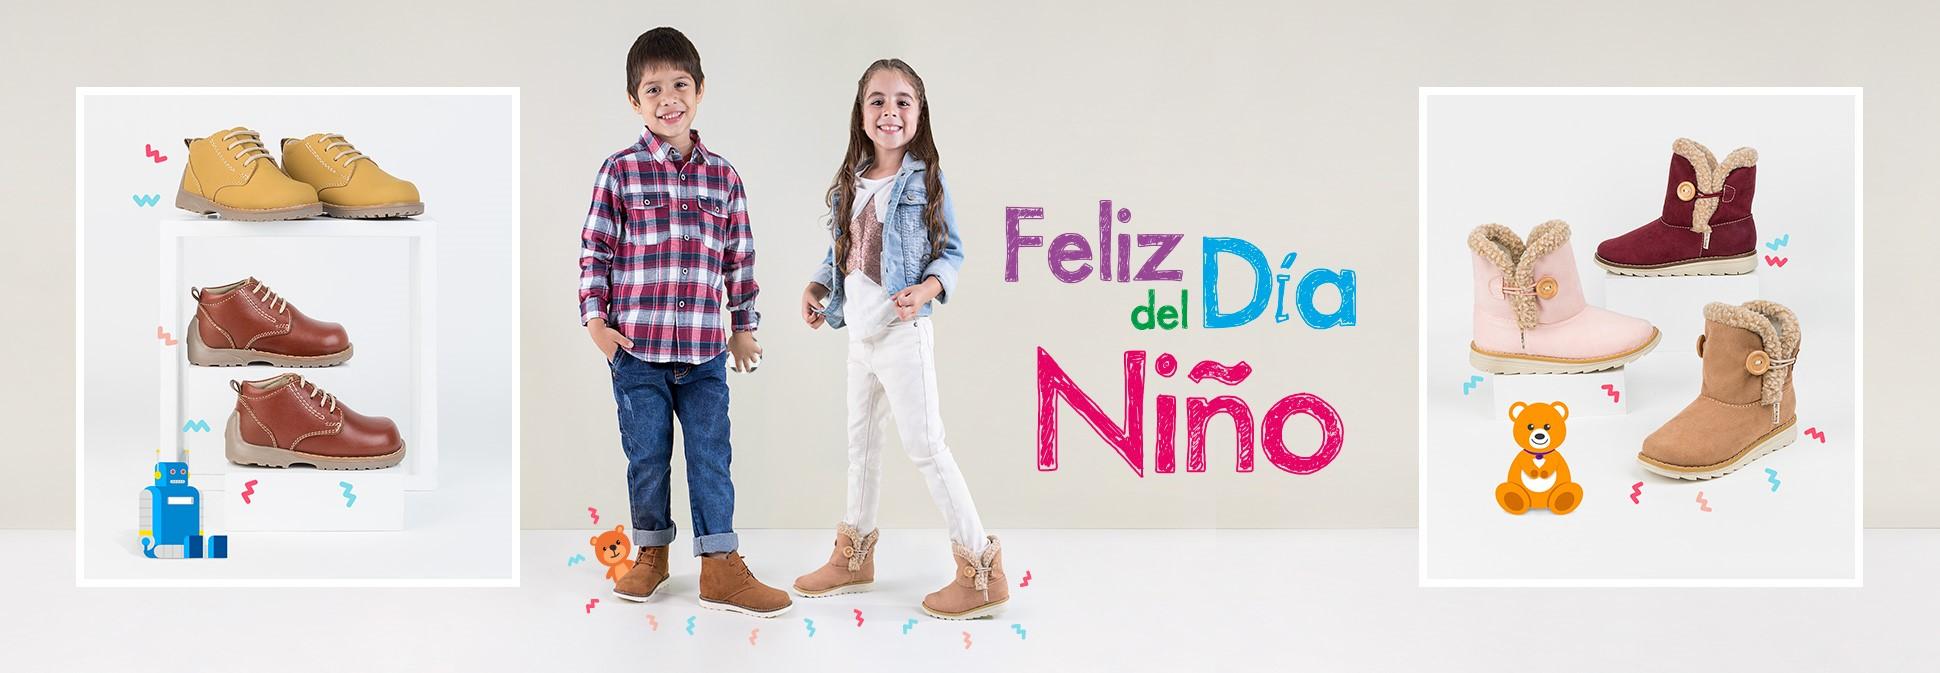 Banner-Dia-del-Niño.jpg